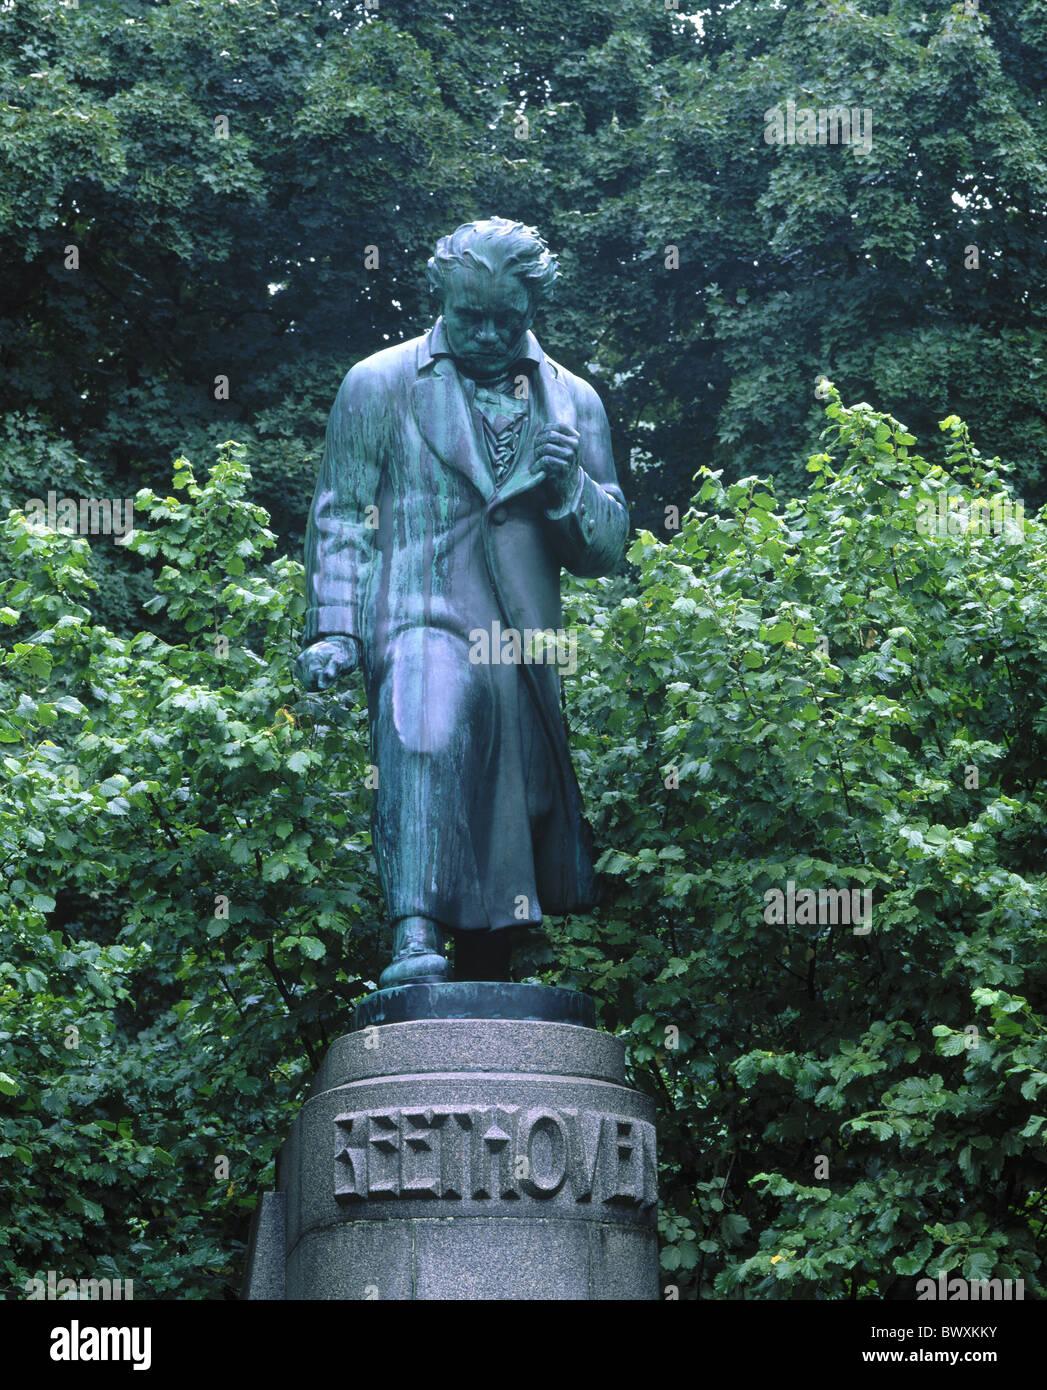 Beethoven Ludwig van bronze monument Karlovy Vary musician sculpture statue Czechia Europe - Stock Image